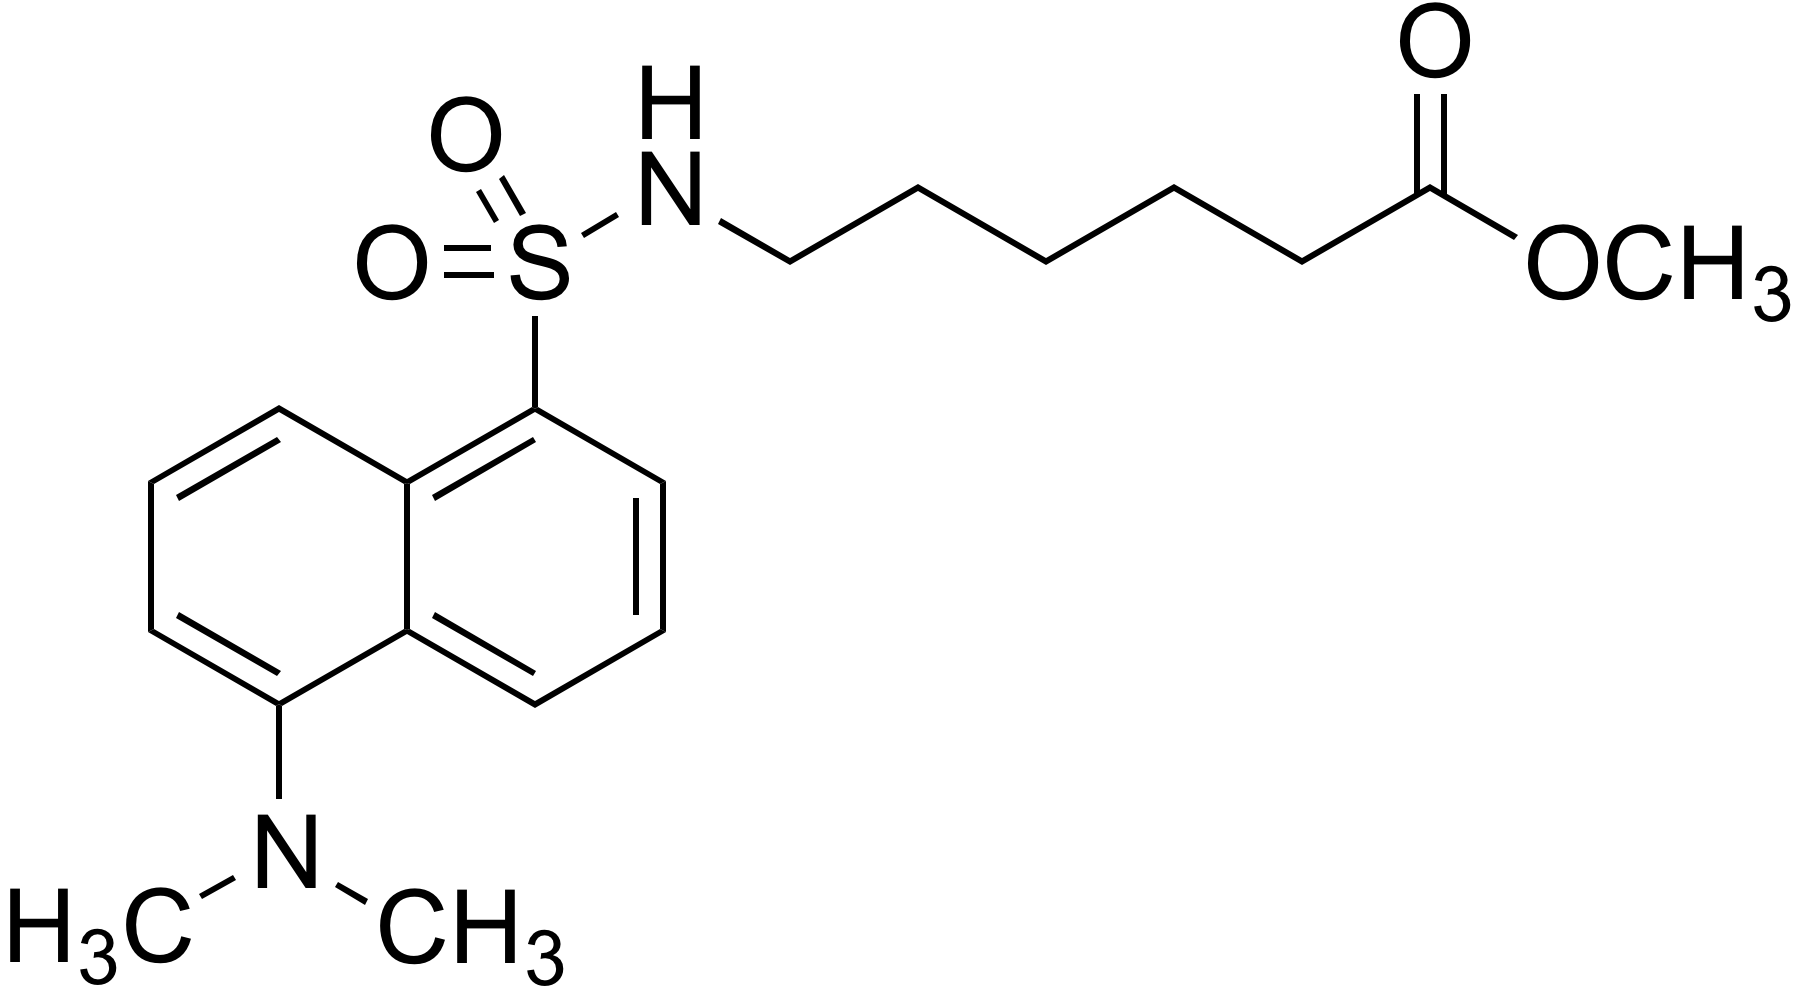 6-(Dansylamino)hexanoic acid methylester